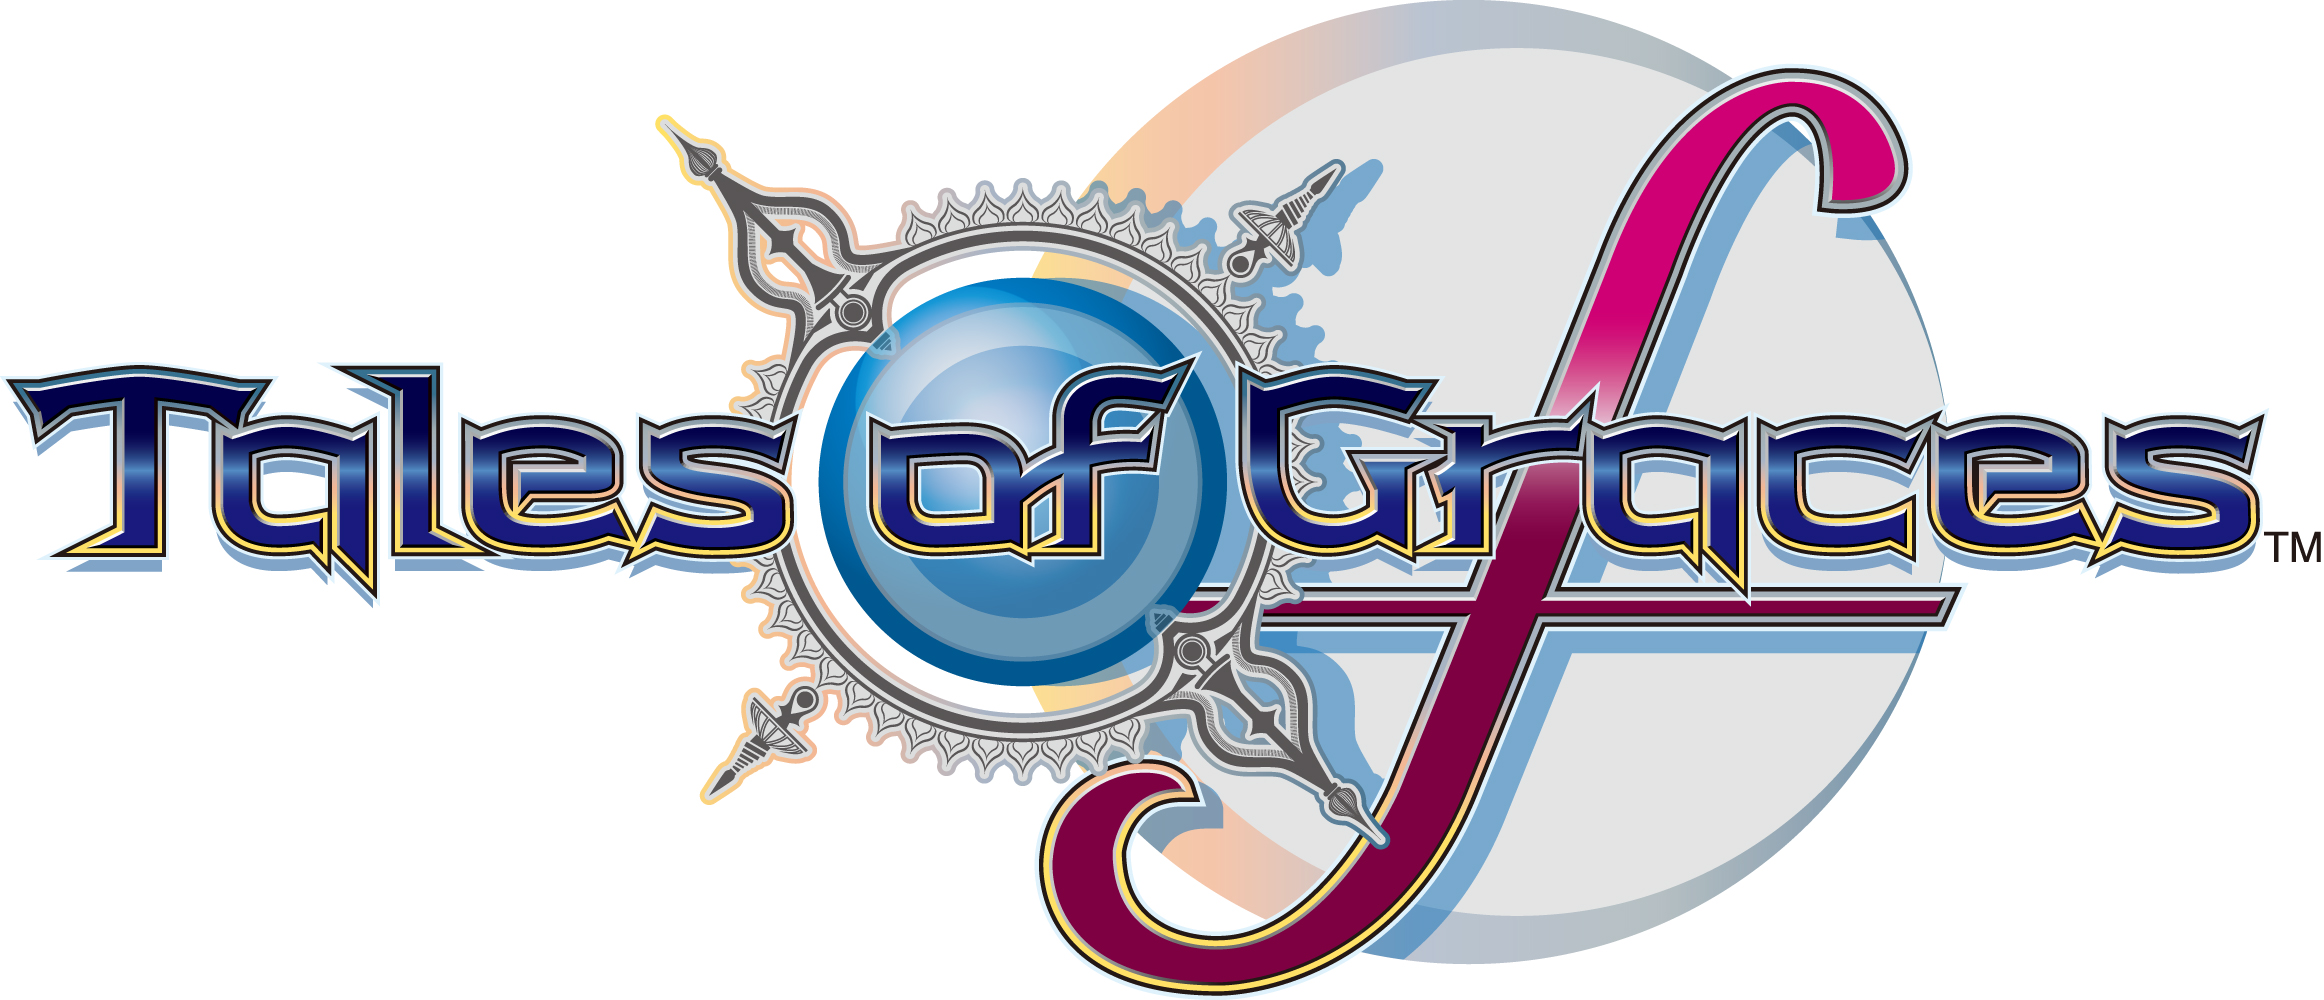 togf_logo_us_eu.jpg